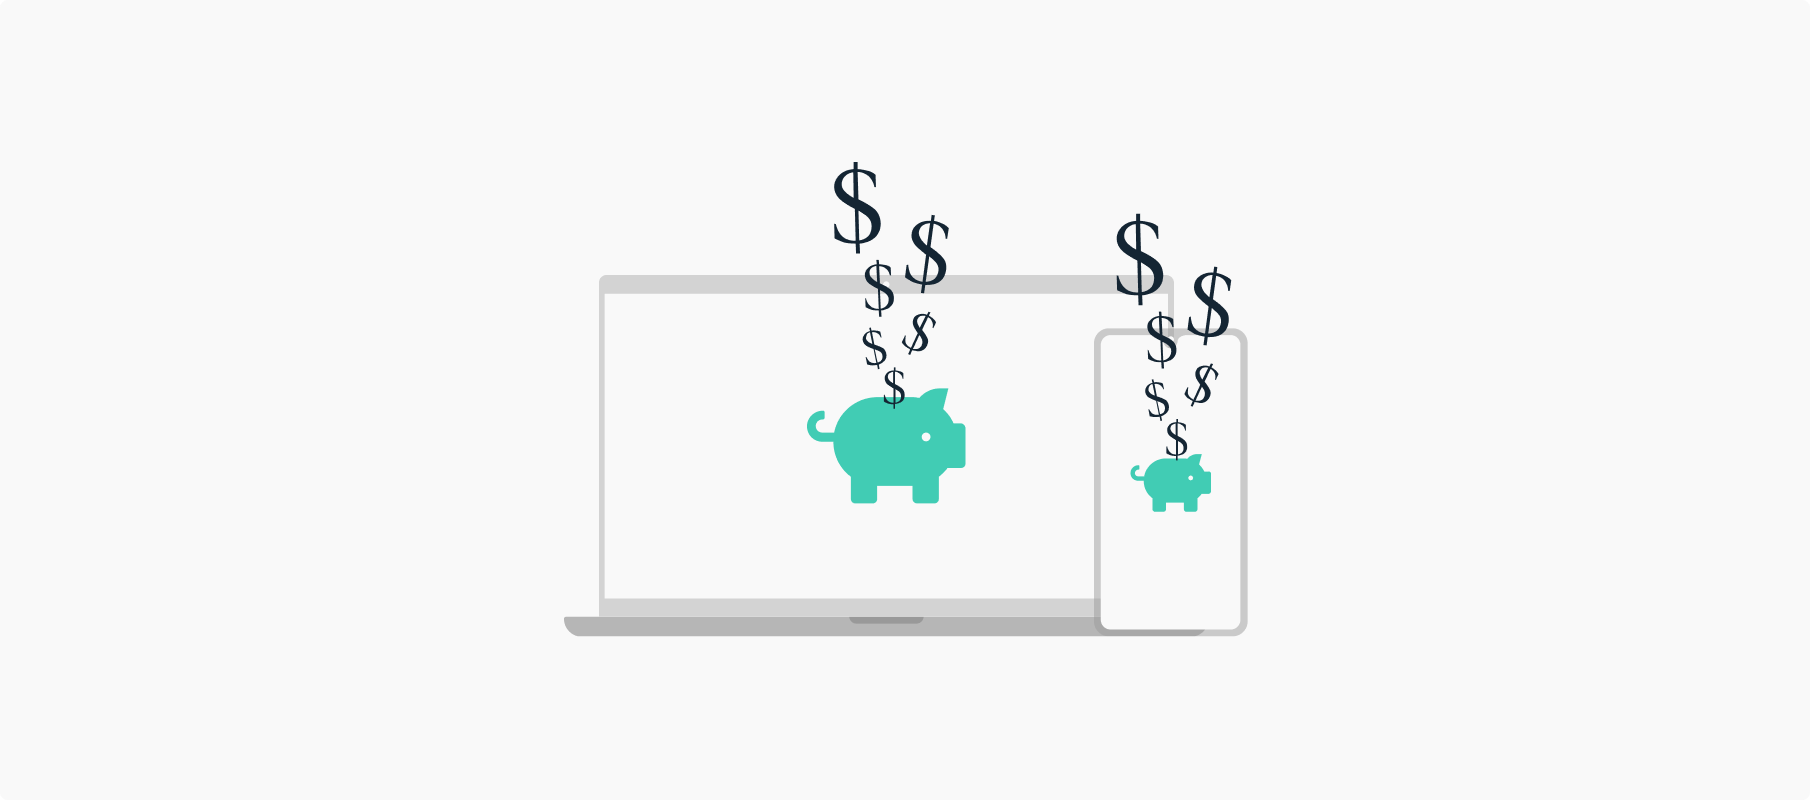 staking and savings